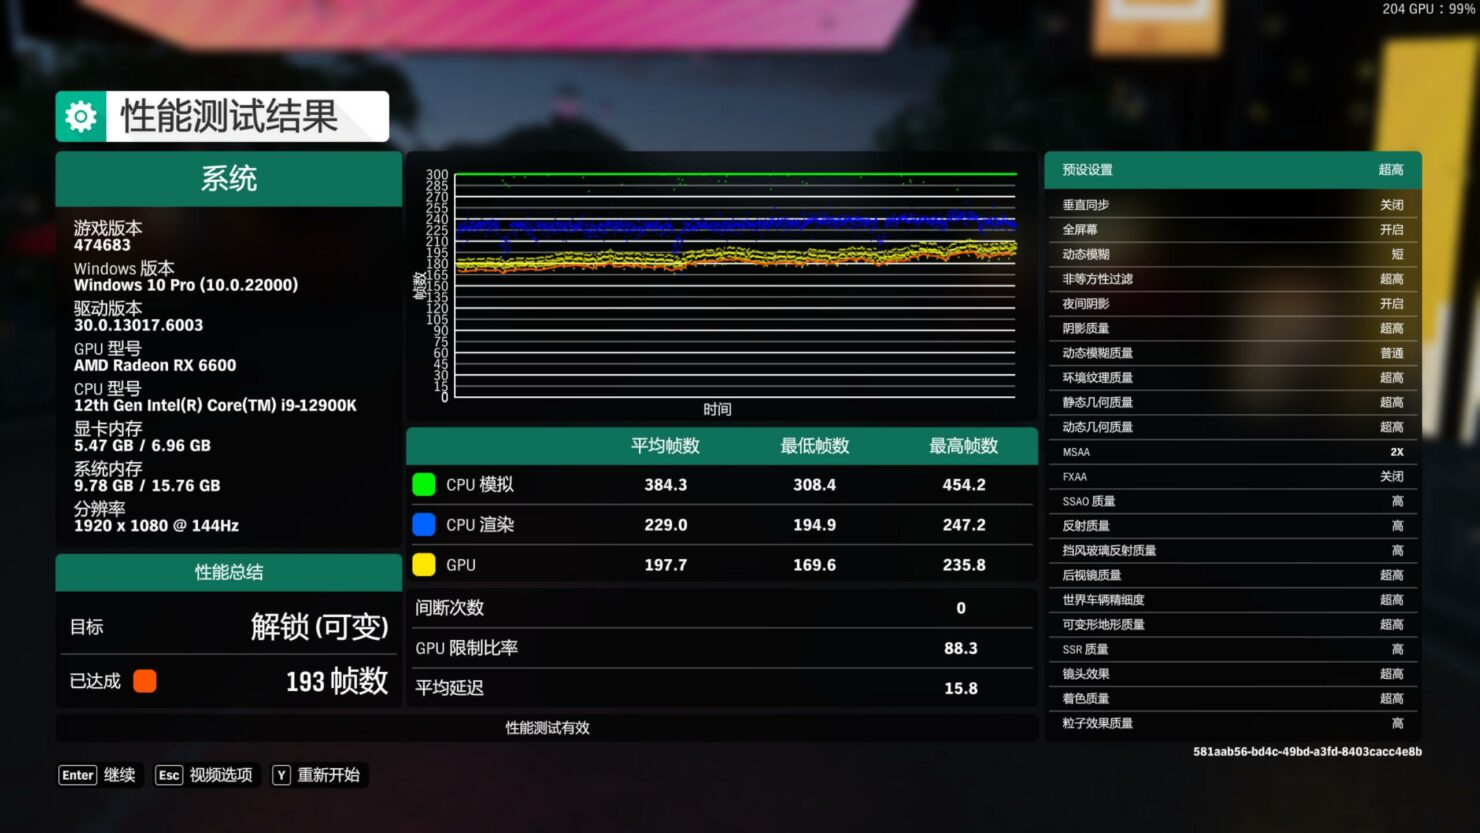 intel-core-i9-12900k-alder-lake-cpu-benchmarks-_-forza-horizon-4